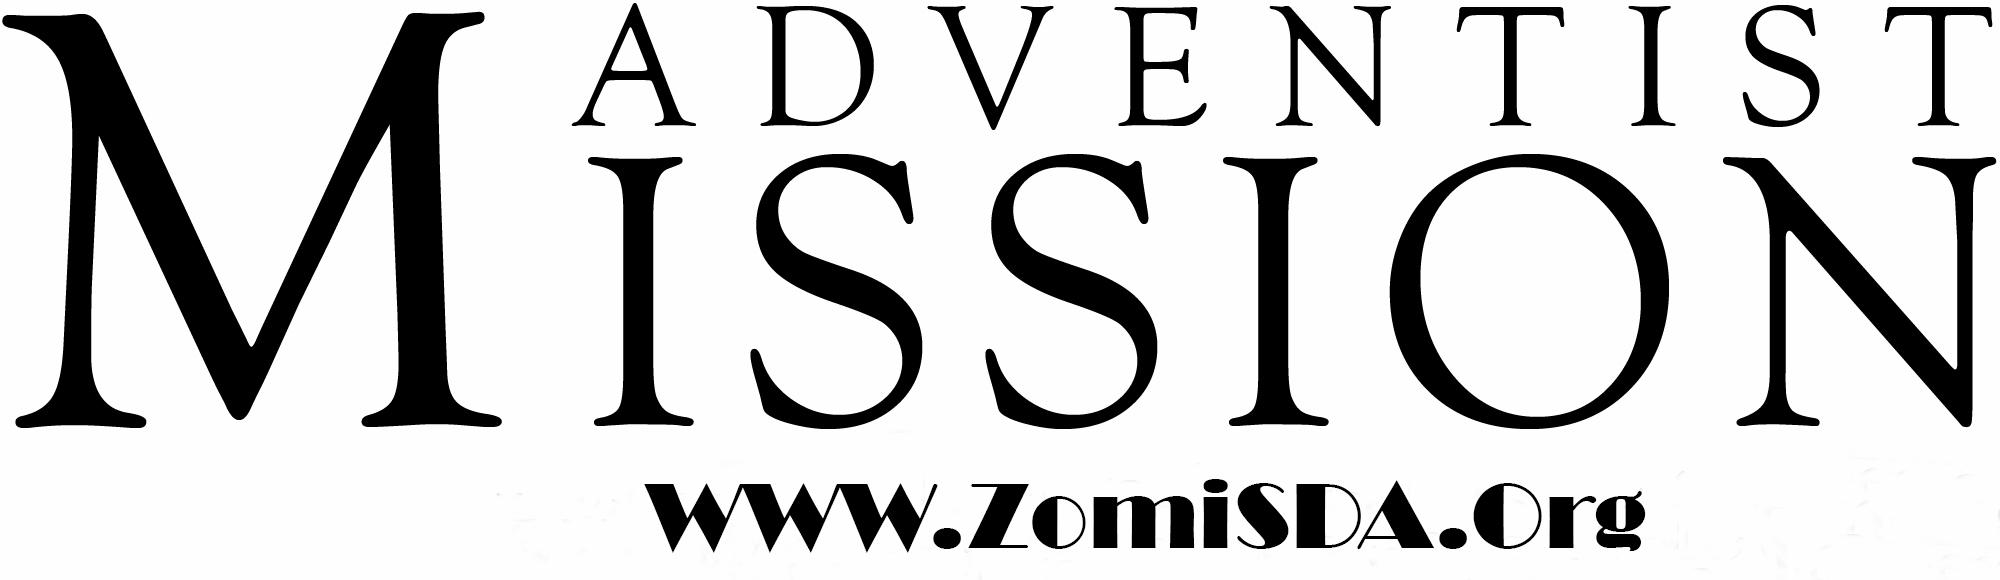 Adventist Mission ZomiSDA